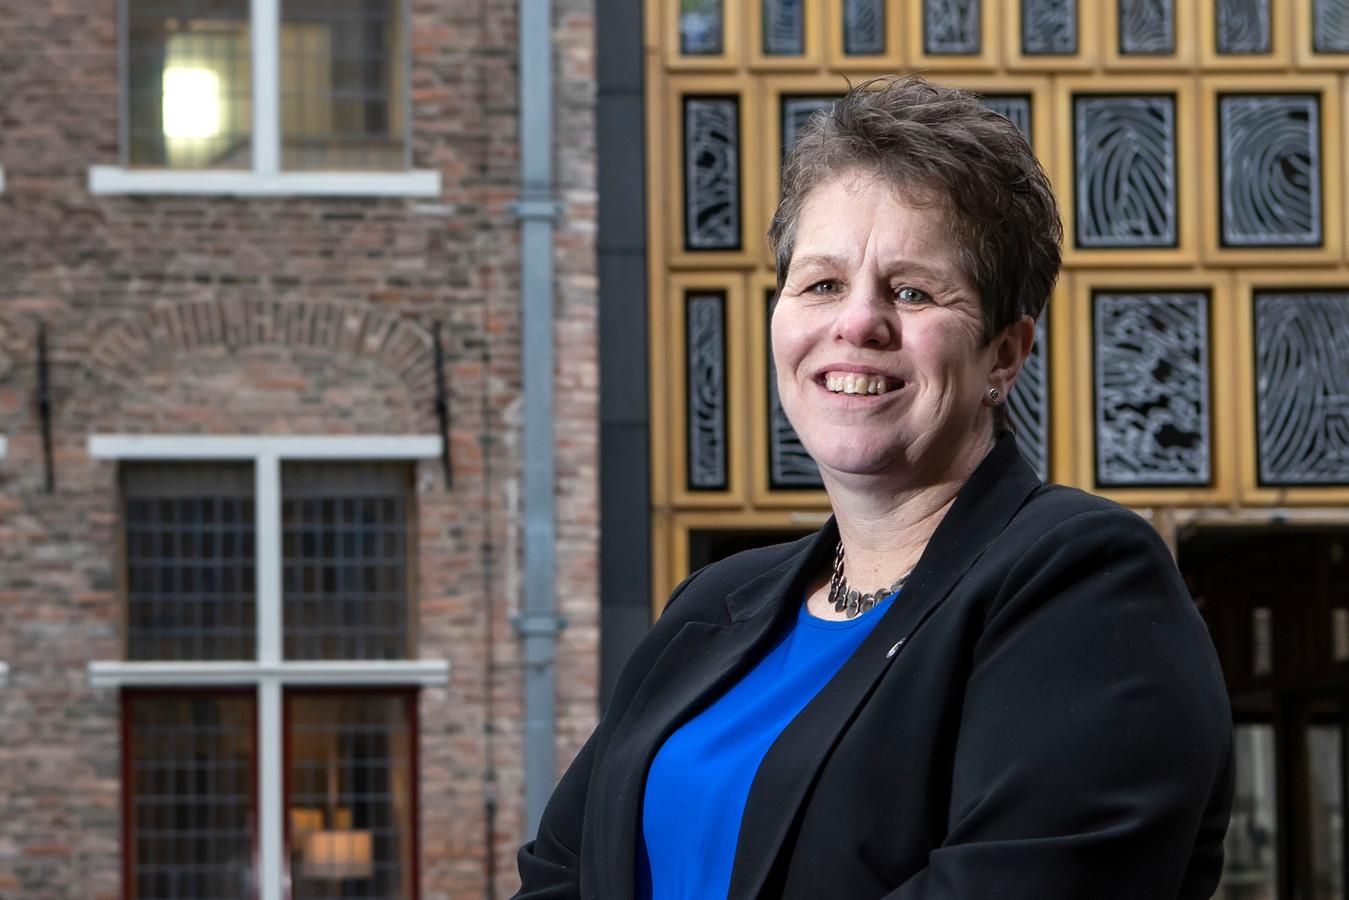 Liesbeth Grijsen, wethouder in Deventer.